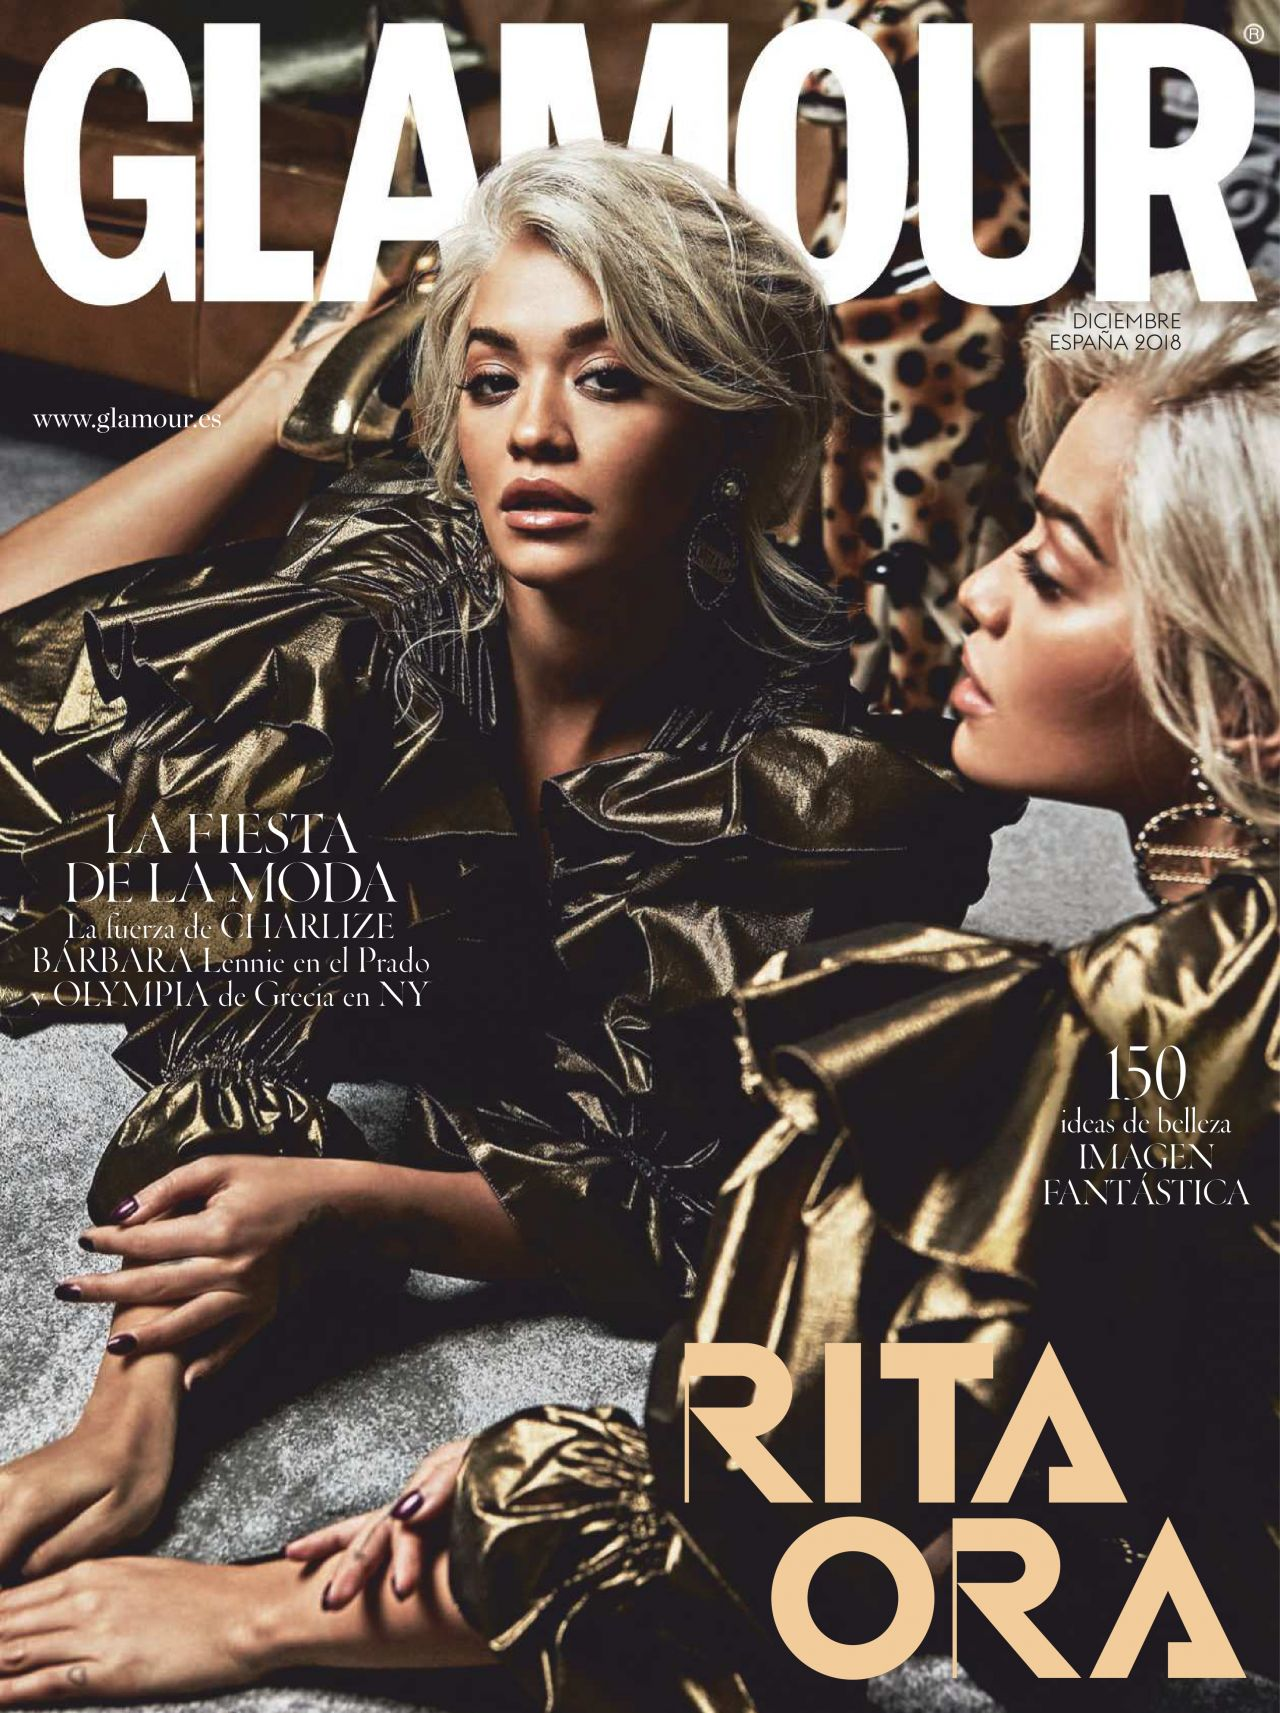 https://celebmafia.com/wp-content/uploads/2018/11/rita-ora-glamour-magazine-spain-11-2018-0.jpg